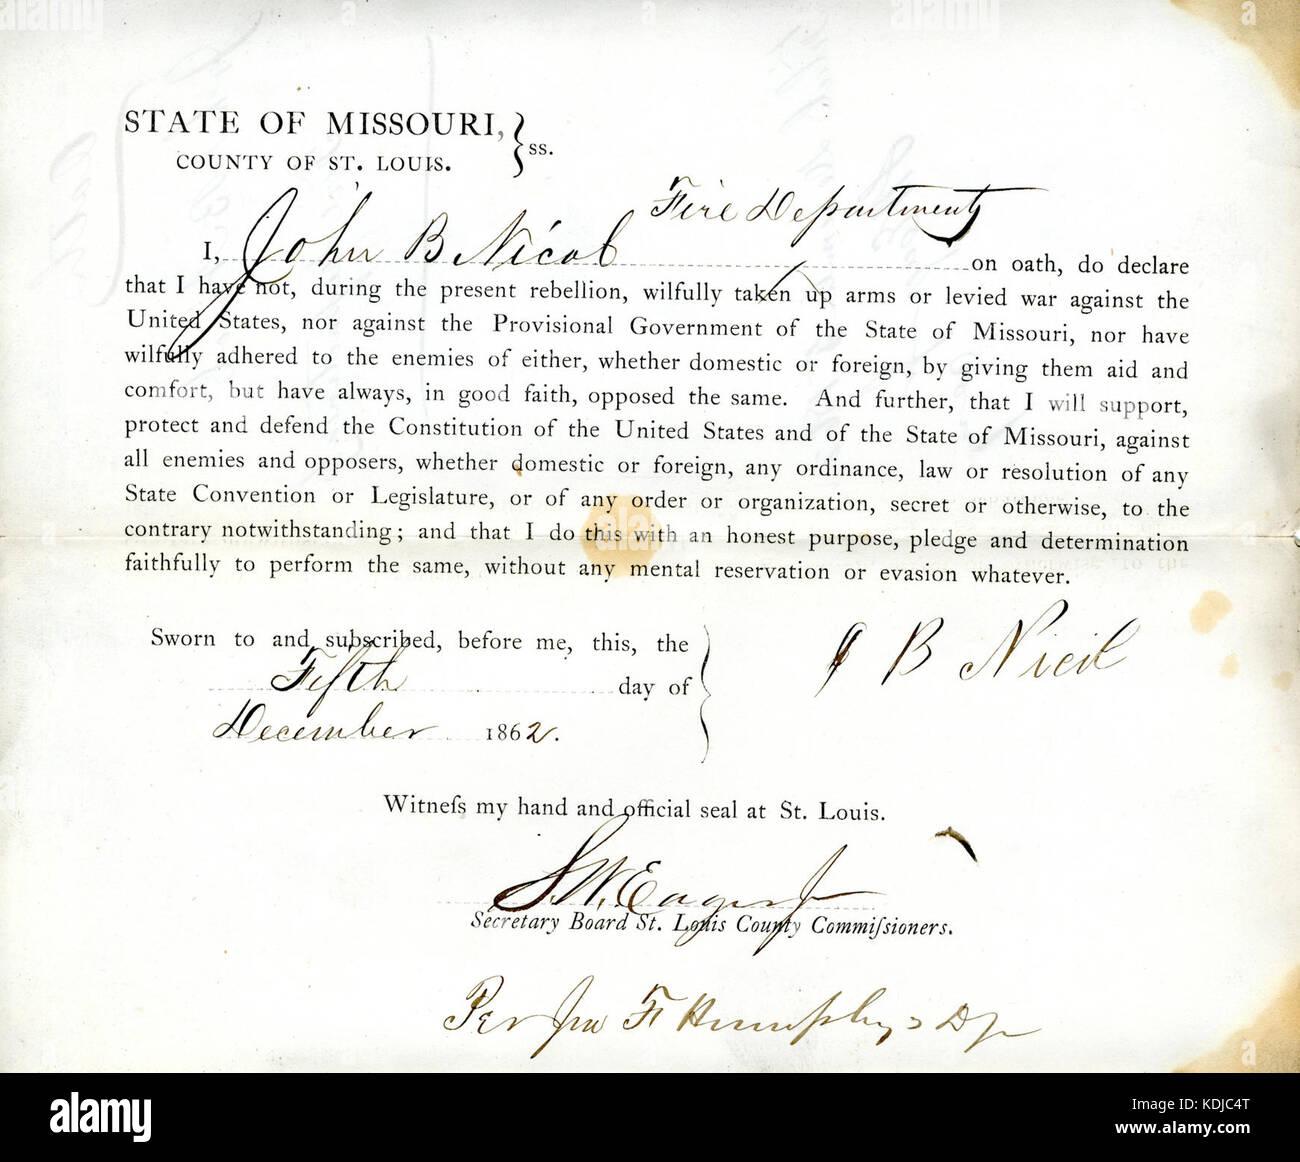 Loyalty oath of John B. Nicol of Missouri, County of St.Louis - Stock Image